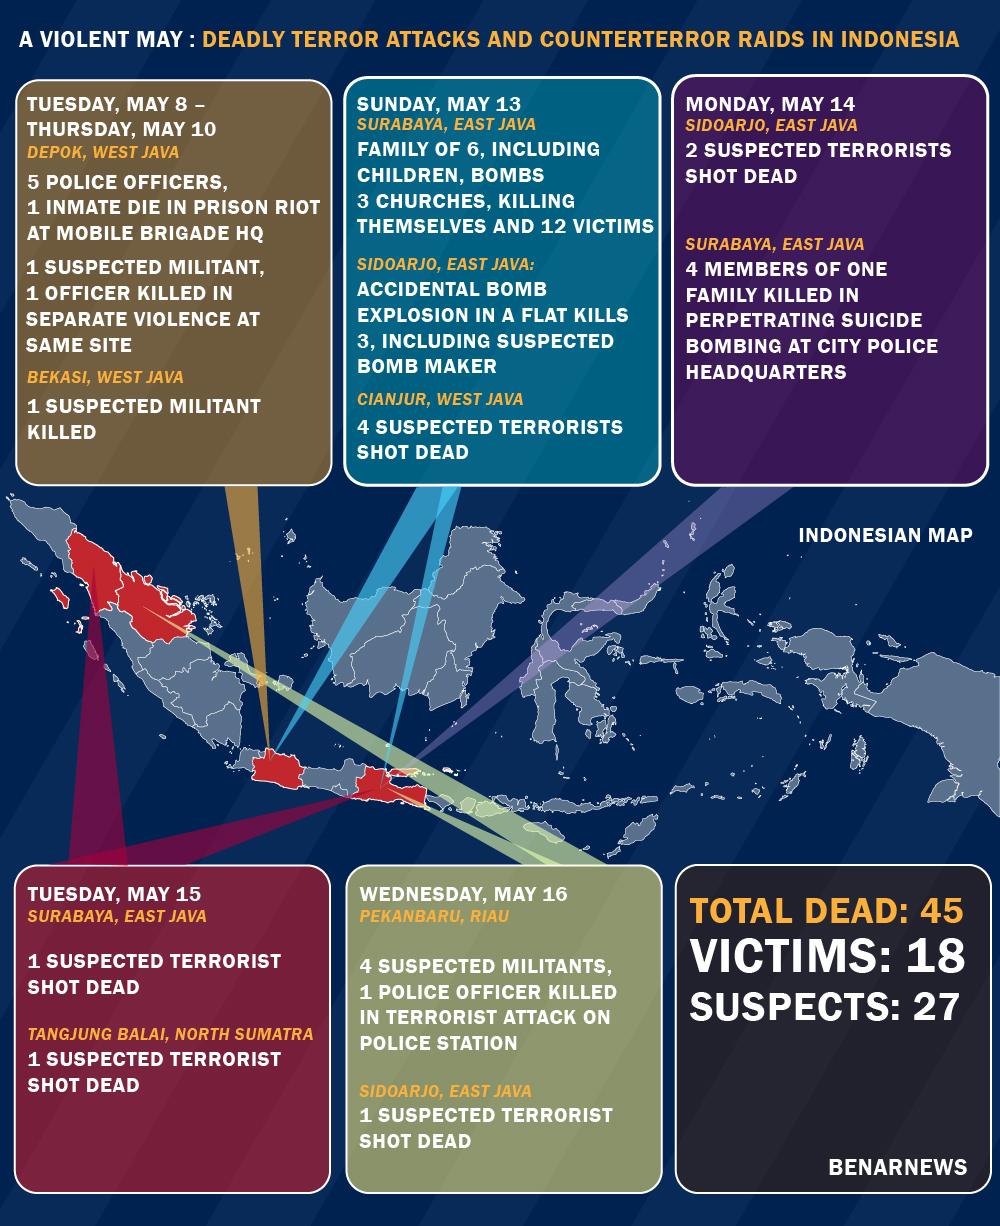 180518-ID-terror-timeline-1000.jpg